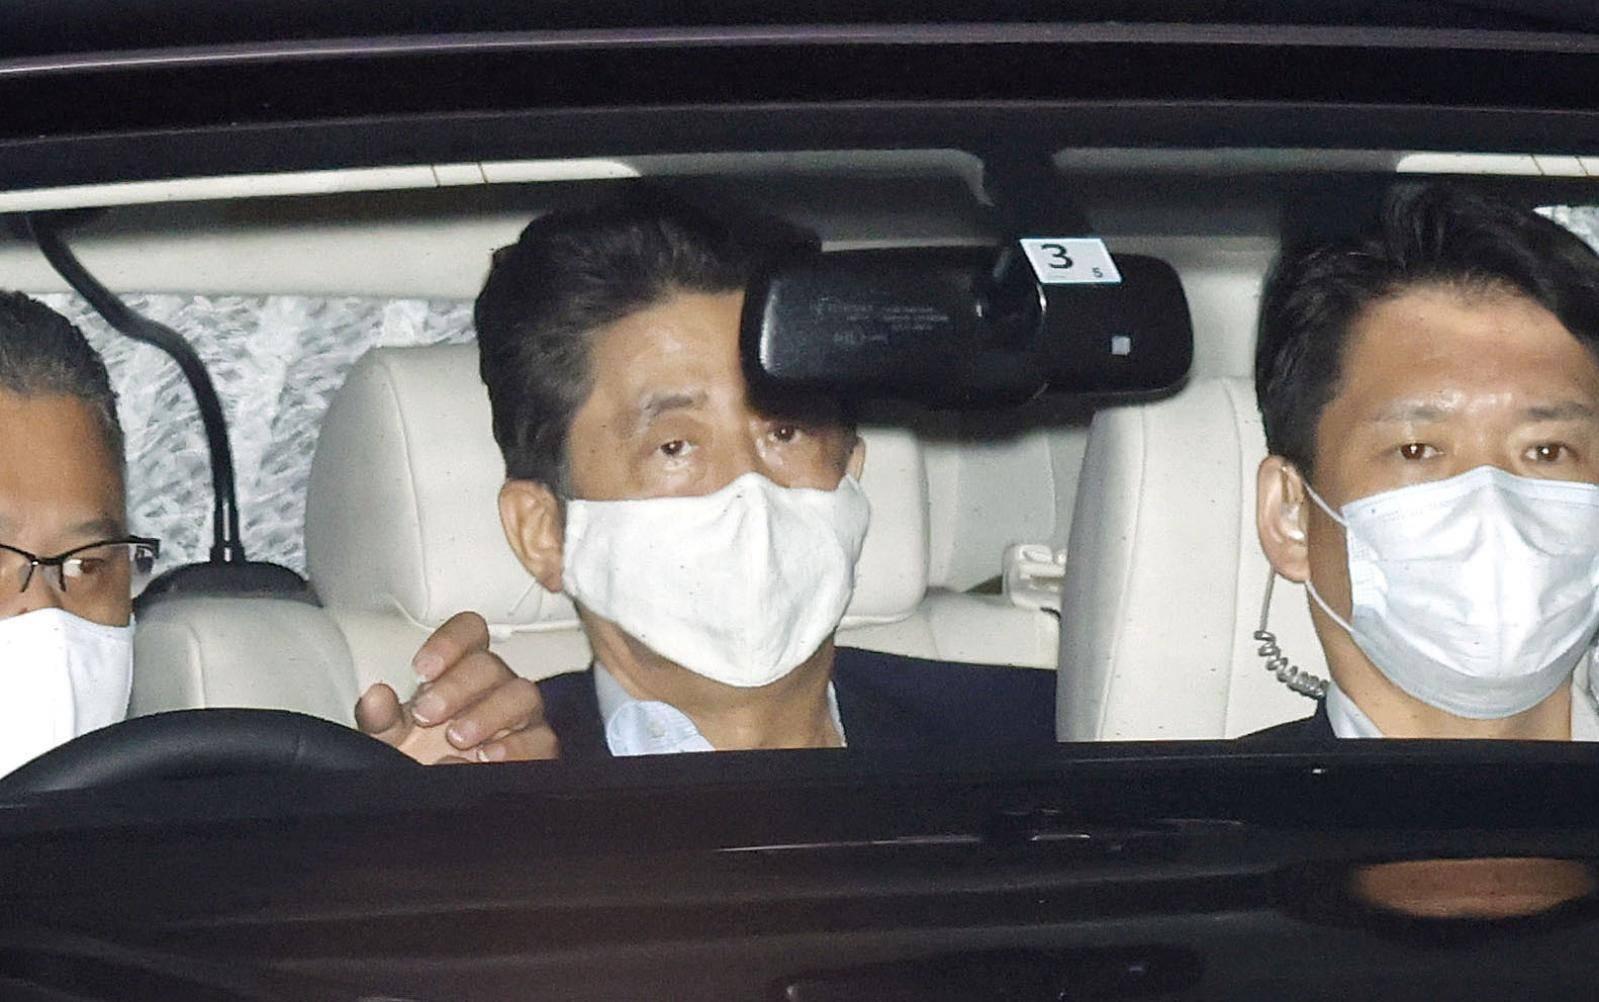 Japanese Prime Minister Shinzo Abe arrives at his residence as he returns from Keio University Hospital in Tokyo